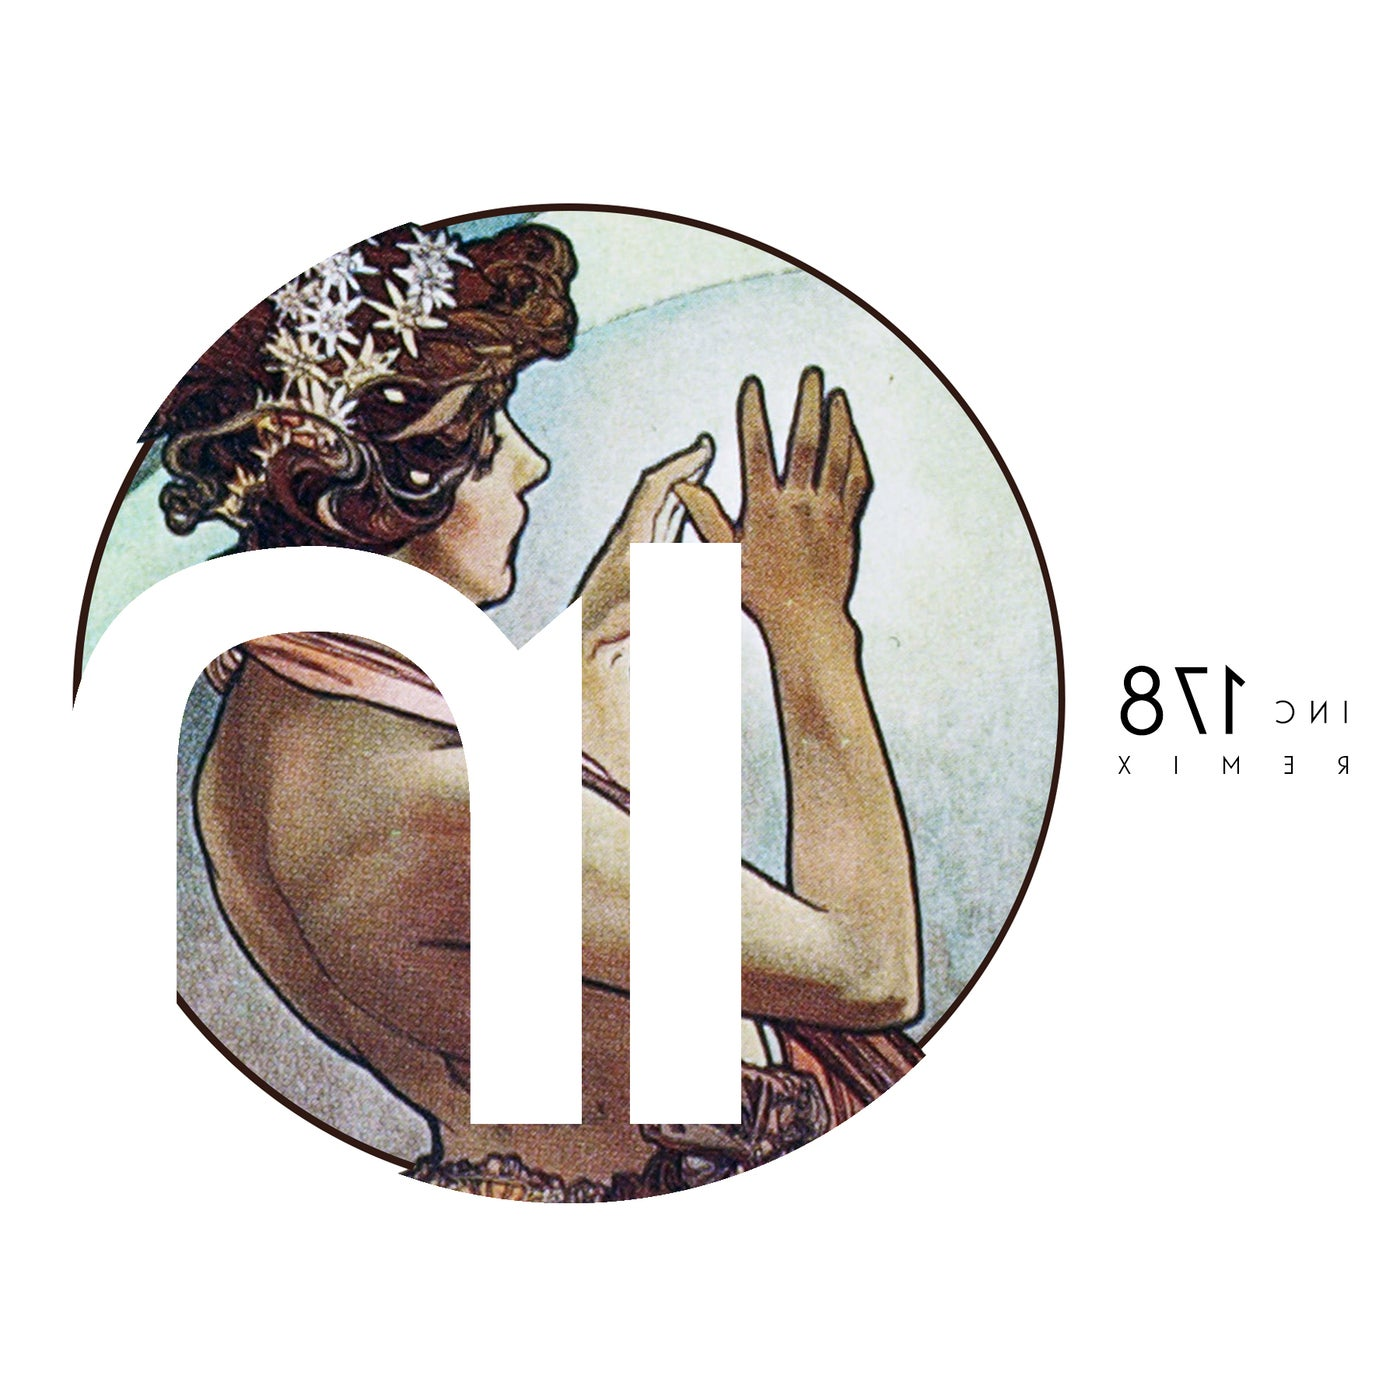 112 (Max Styler Remix)